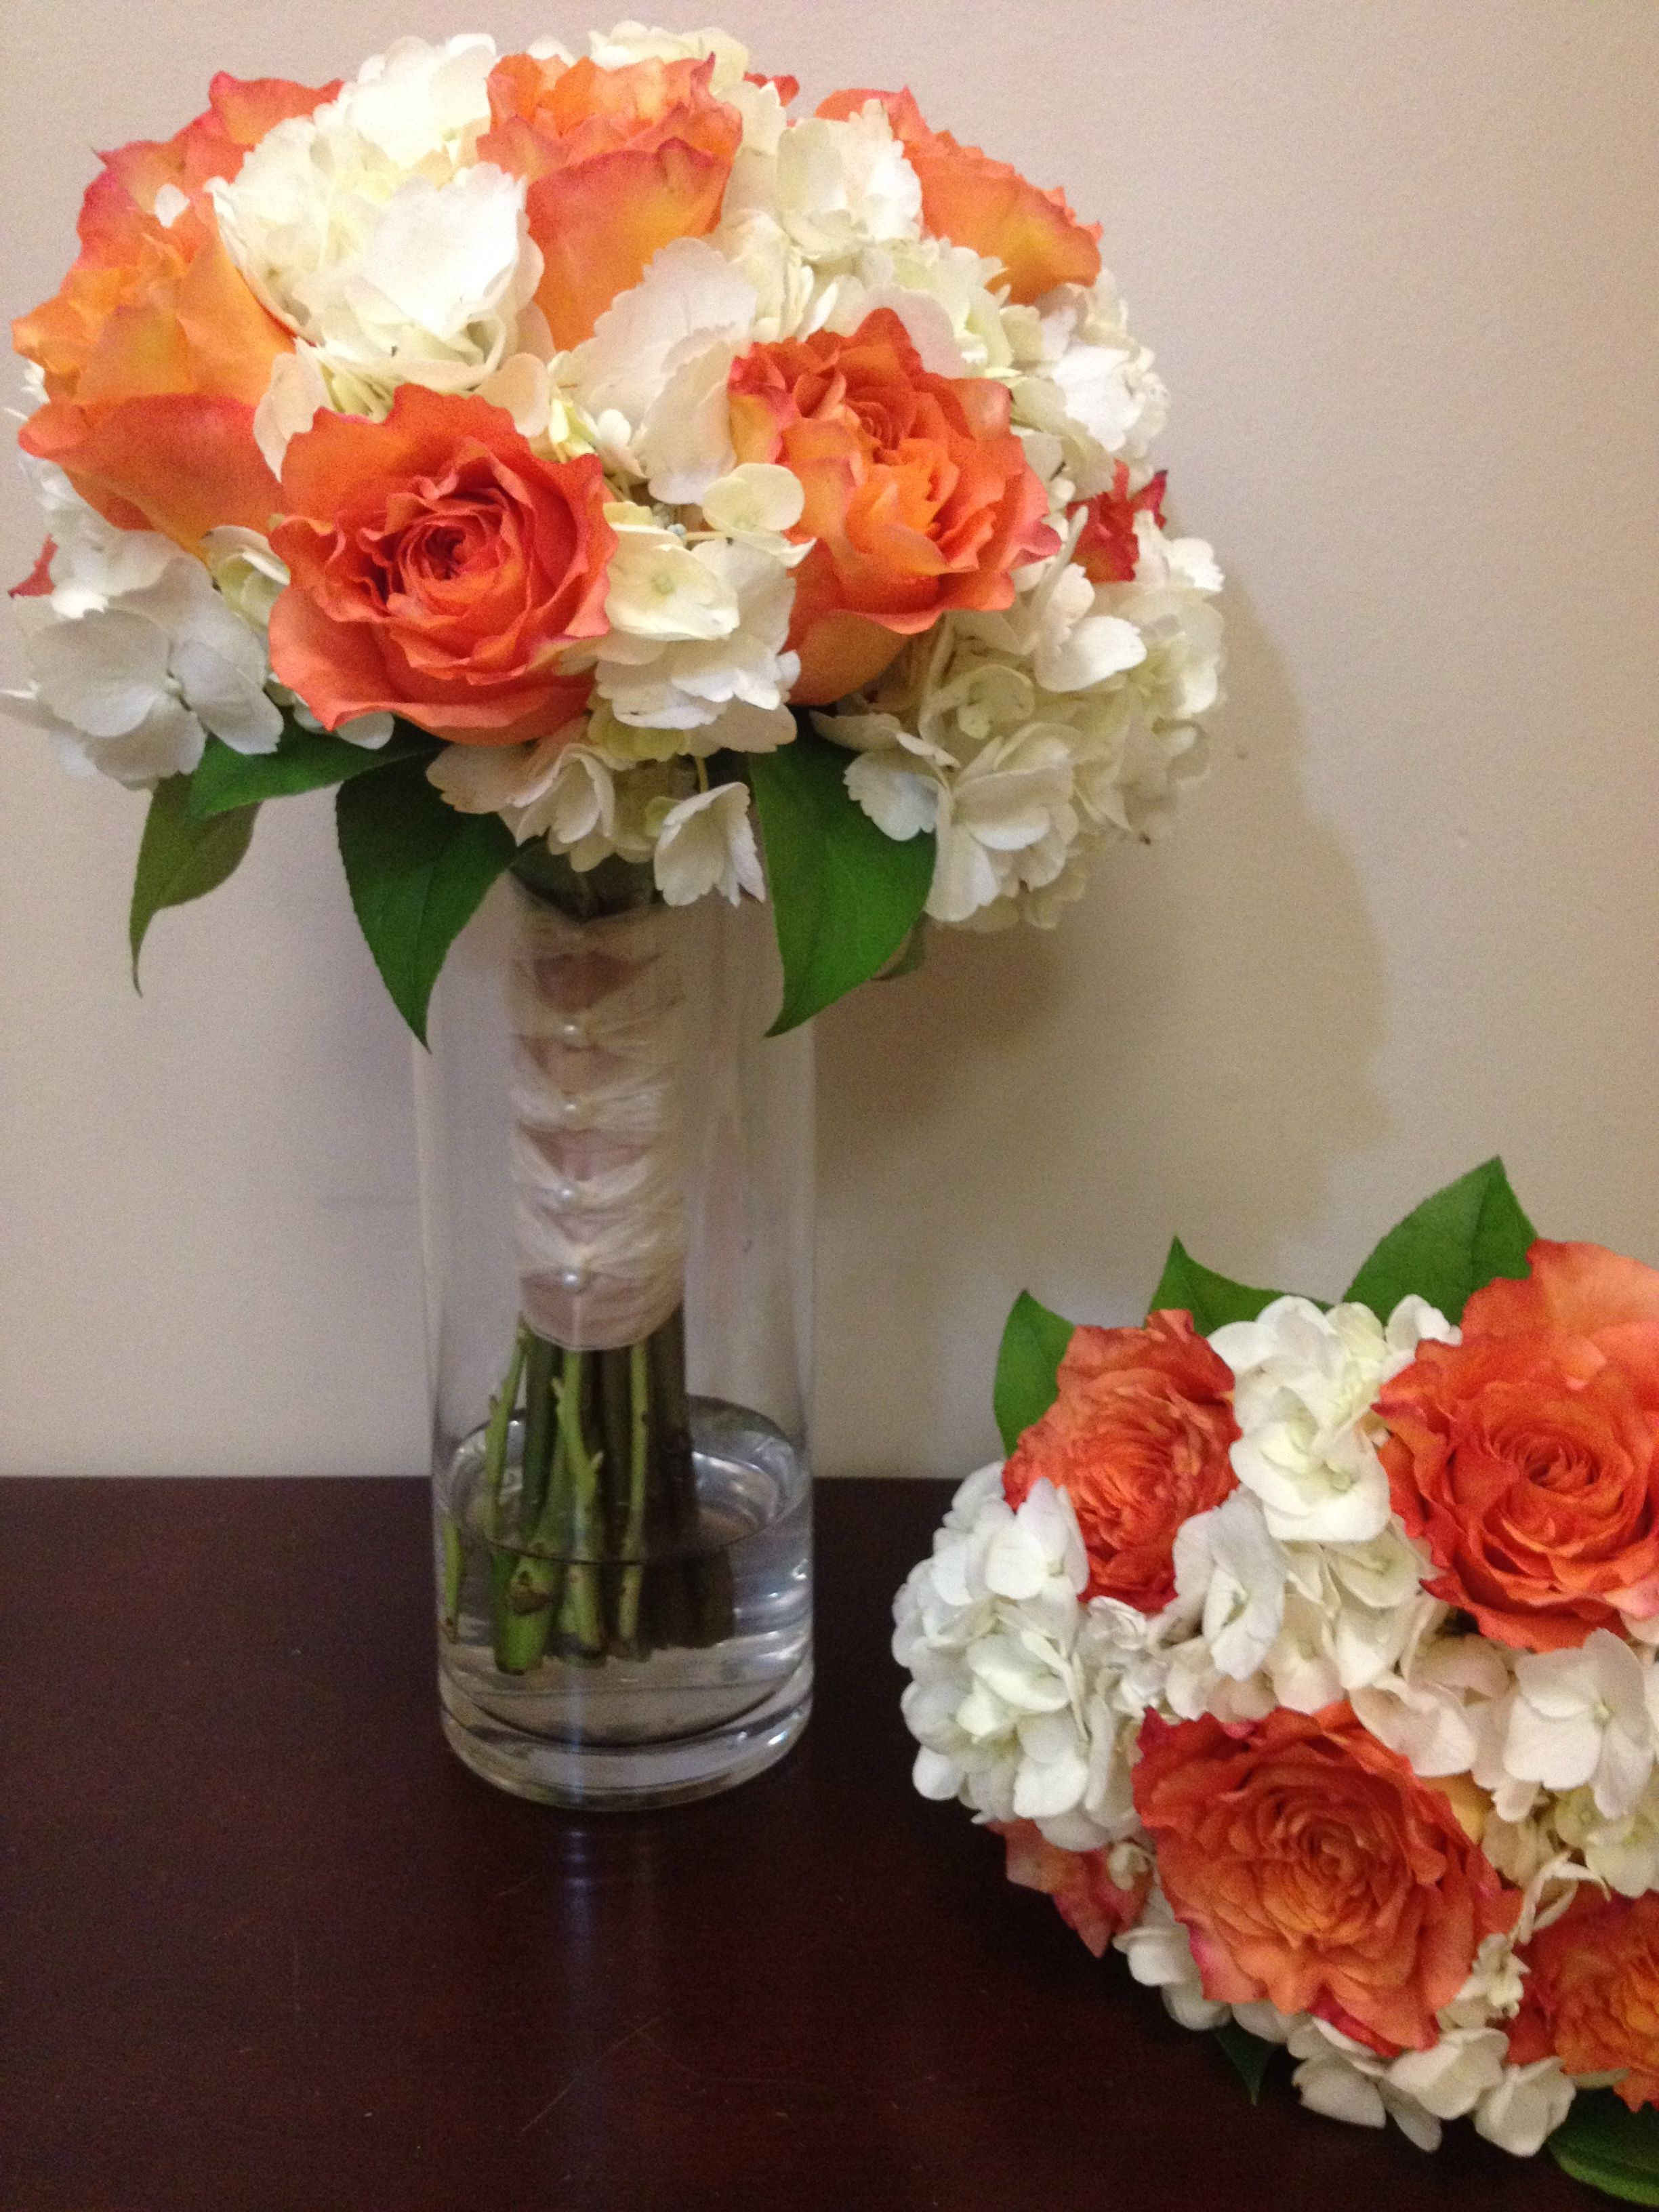 Hydrangea Free Spirit Rose Bridal Tossing Bouquets. www